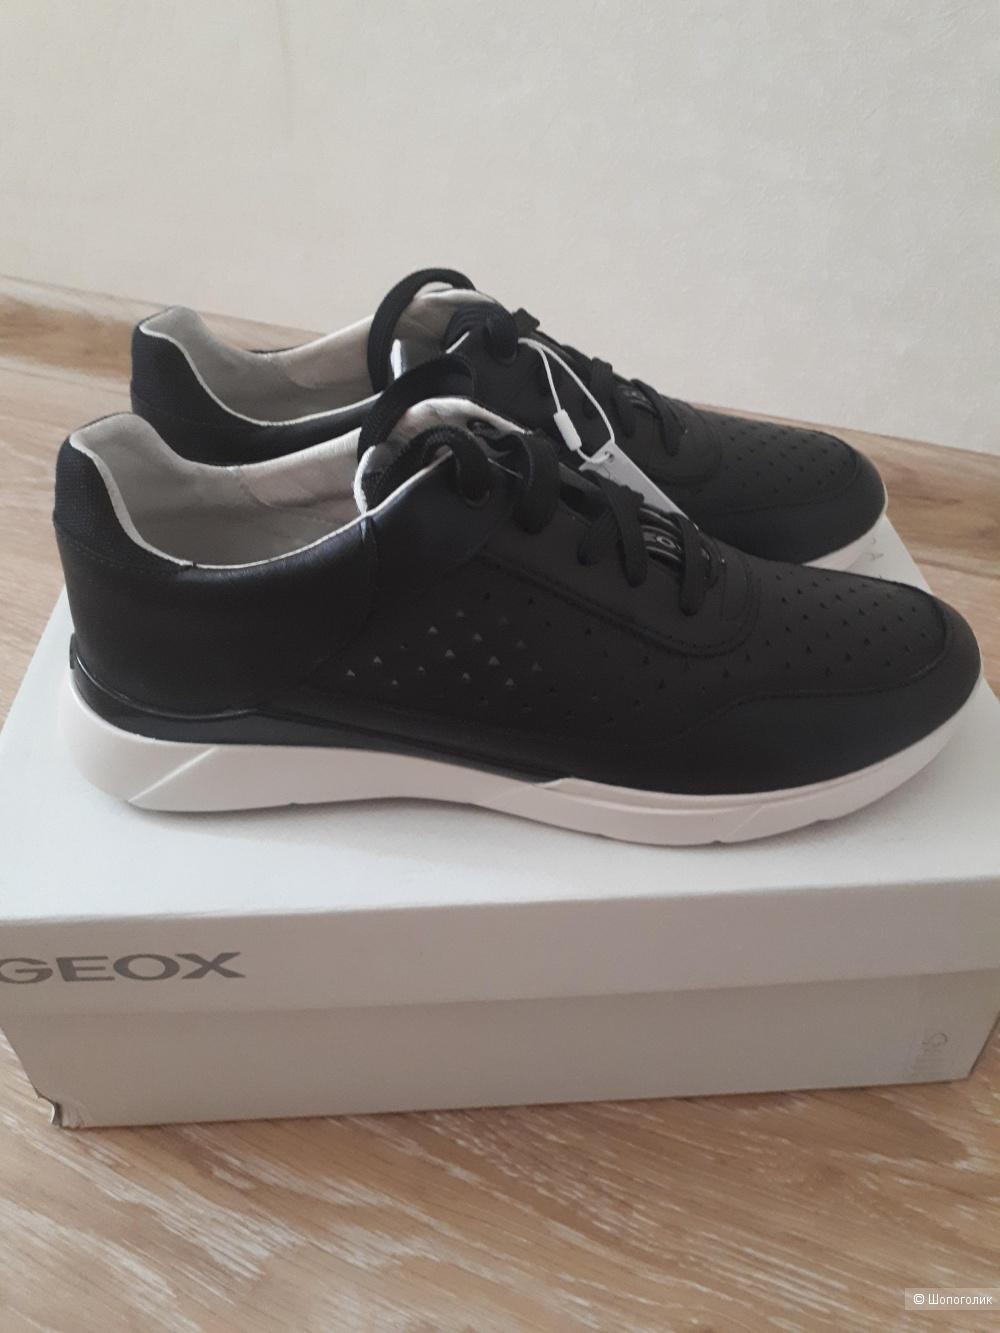 Кроссовки Geox, размер 38